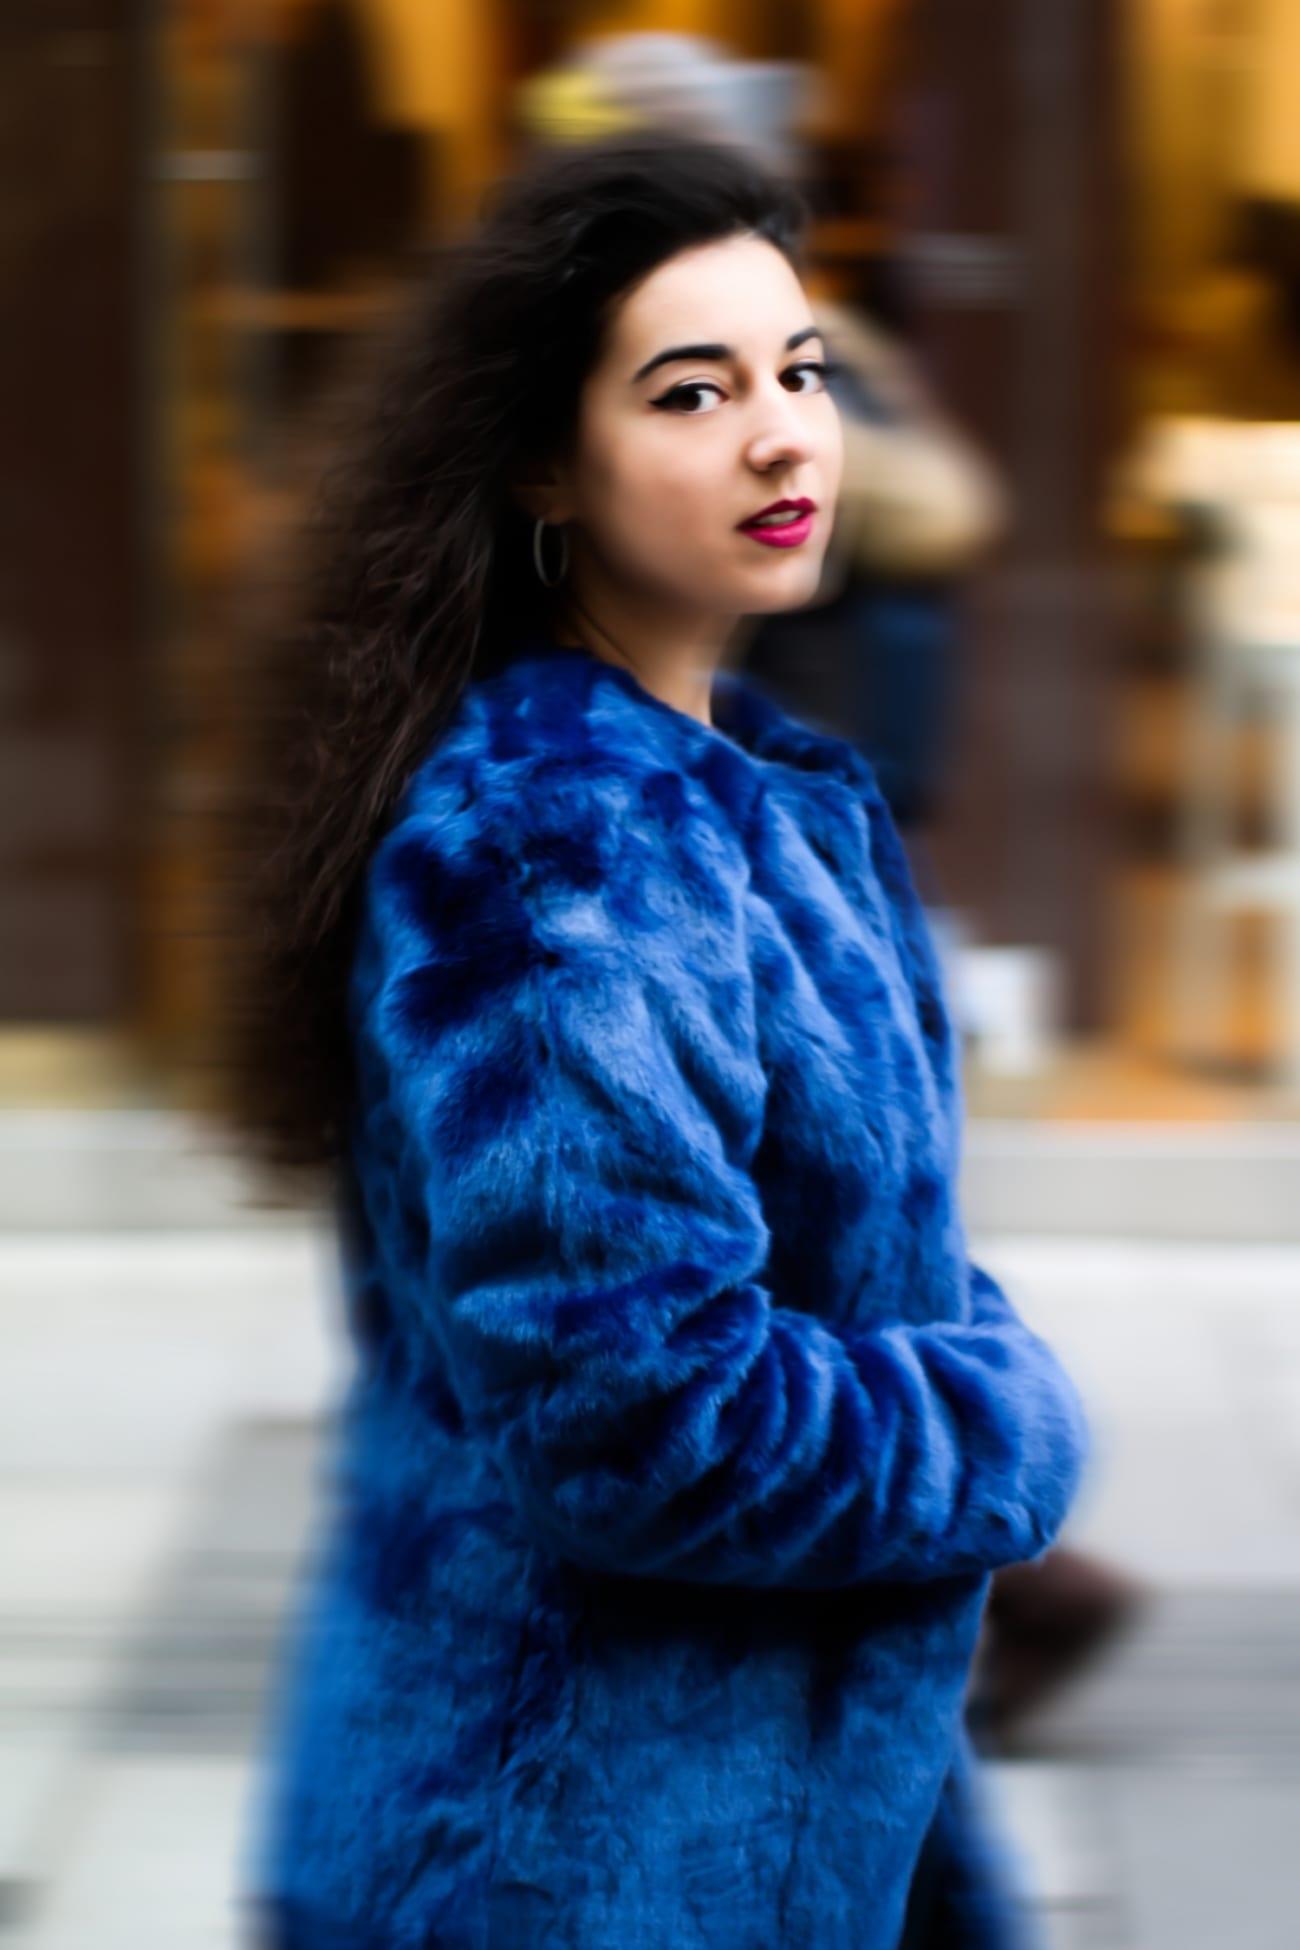 bonprix romania blogger colaborare roxi rose blue musthaves advice sfaturi moda blog timisoara bucuresti collaboration vienna wien viena austria bucuresti moda fashion